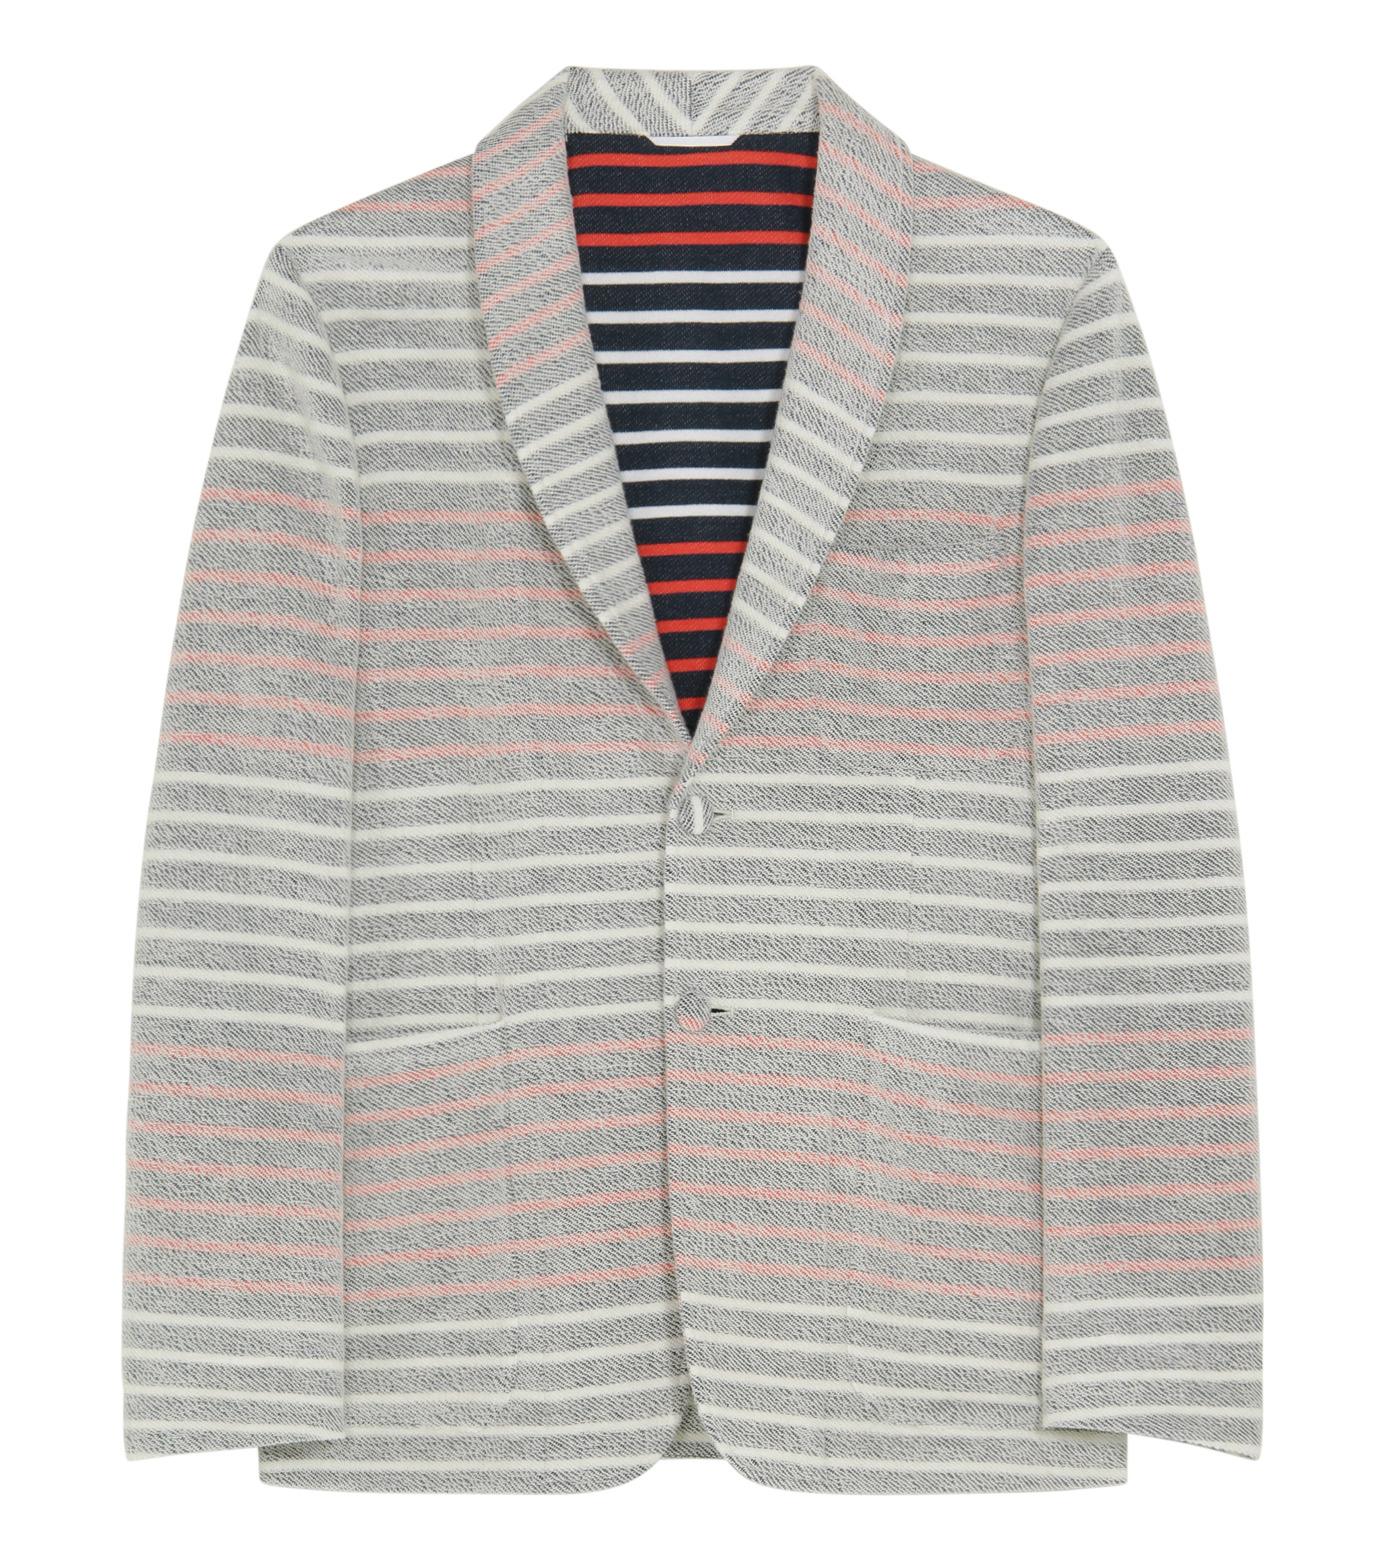 Thom Browne(トムブラウン)のBorder pile jacket-WHITE-MJU065AK6941-4 拡大詳細画像1